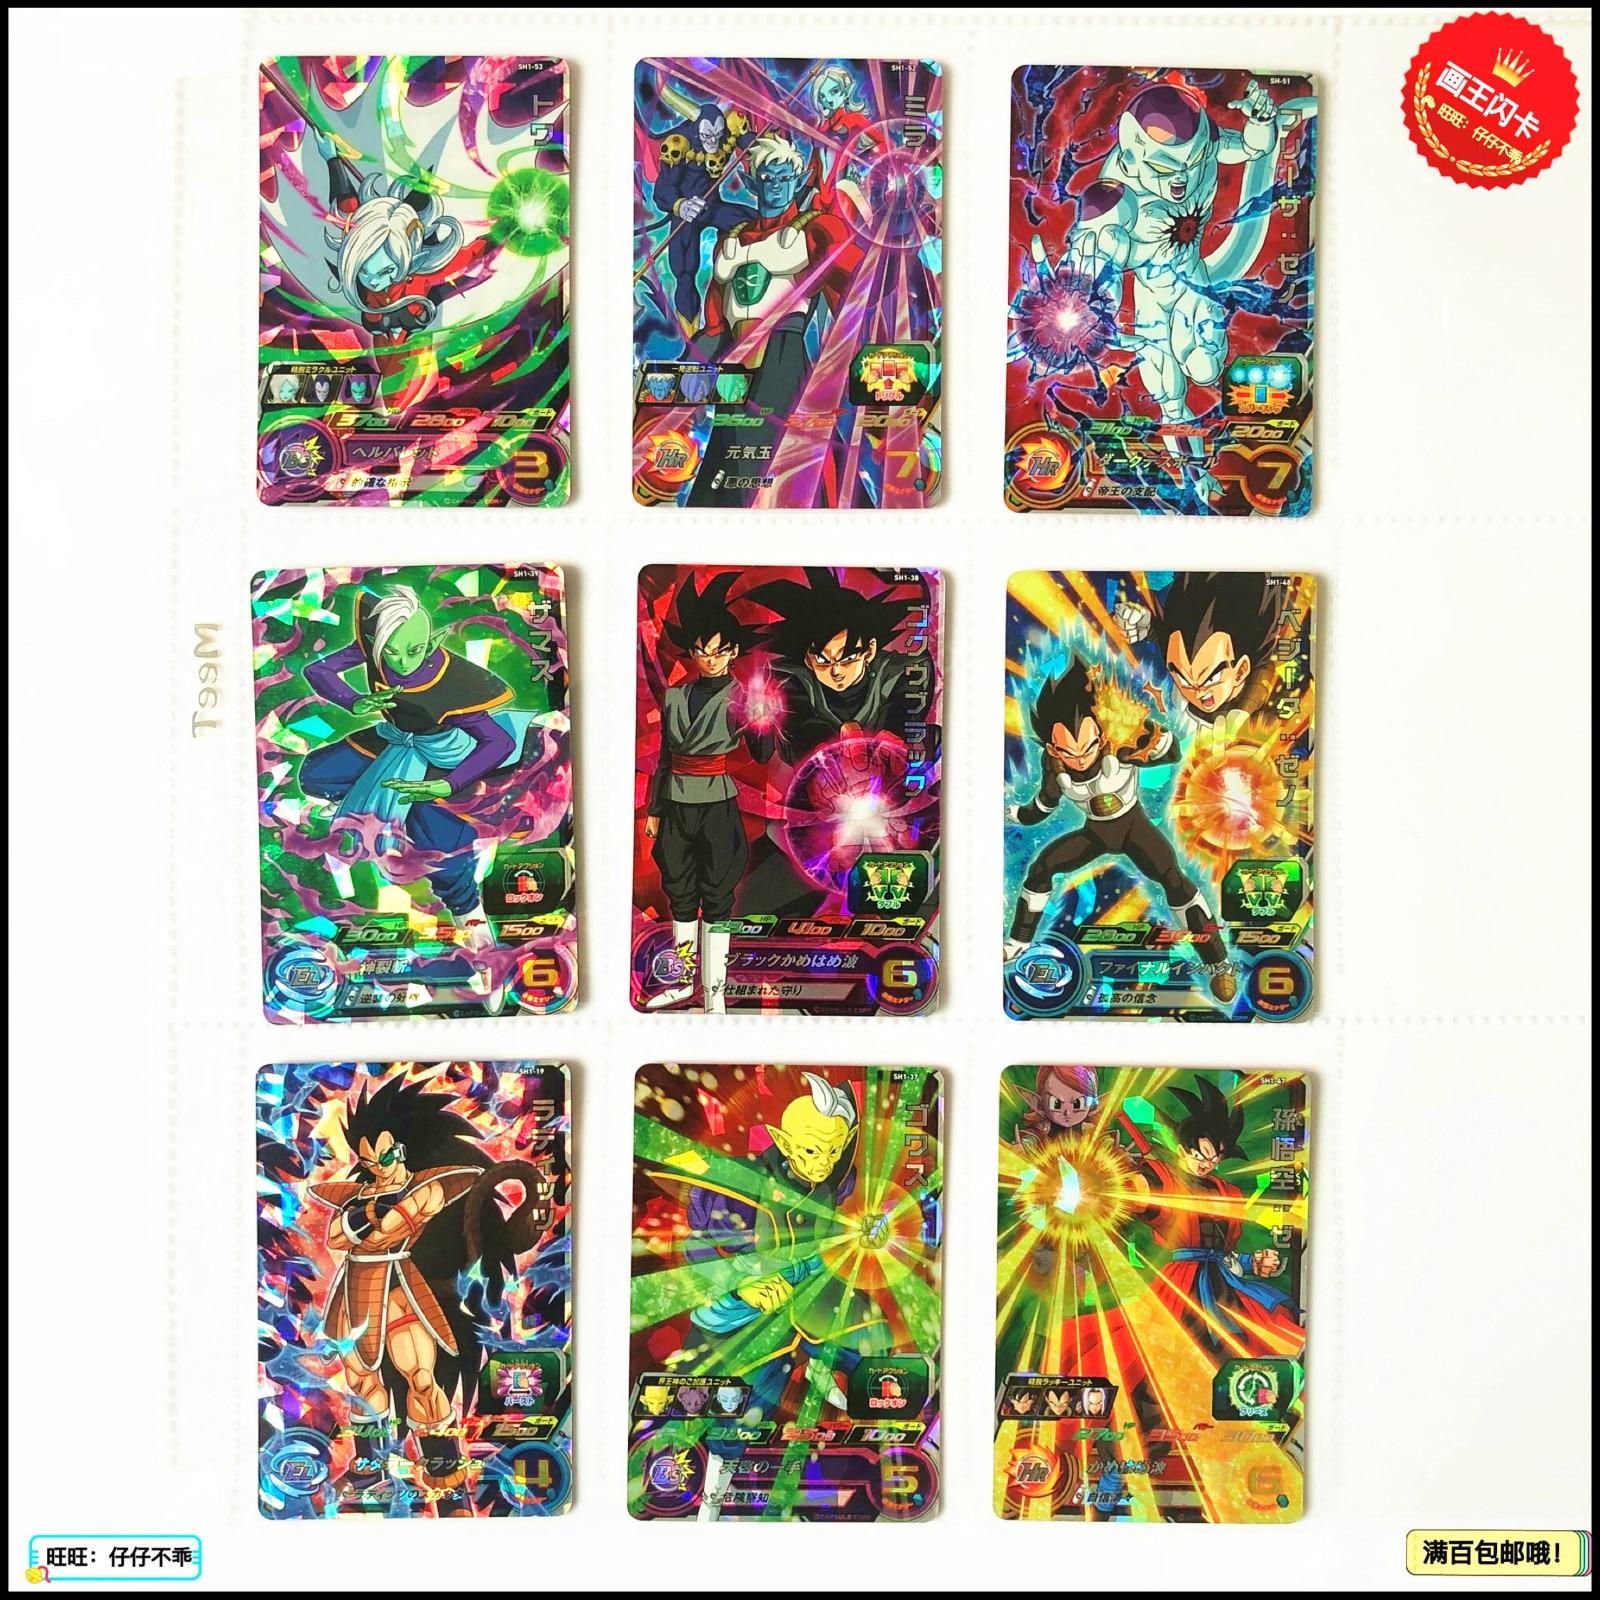 9pcs Japan Original Dragon Ball Hero Card SR Flash 3 Stars SH1 Goku Toys Hobbies Collectibles Game Collection Anime Cards